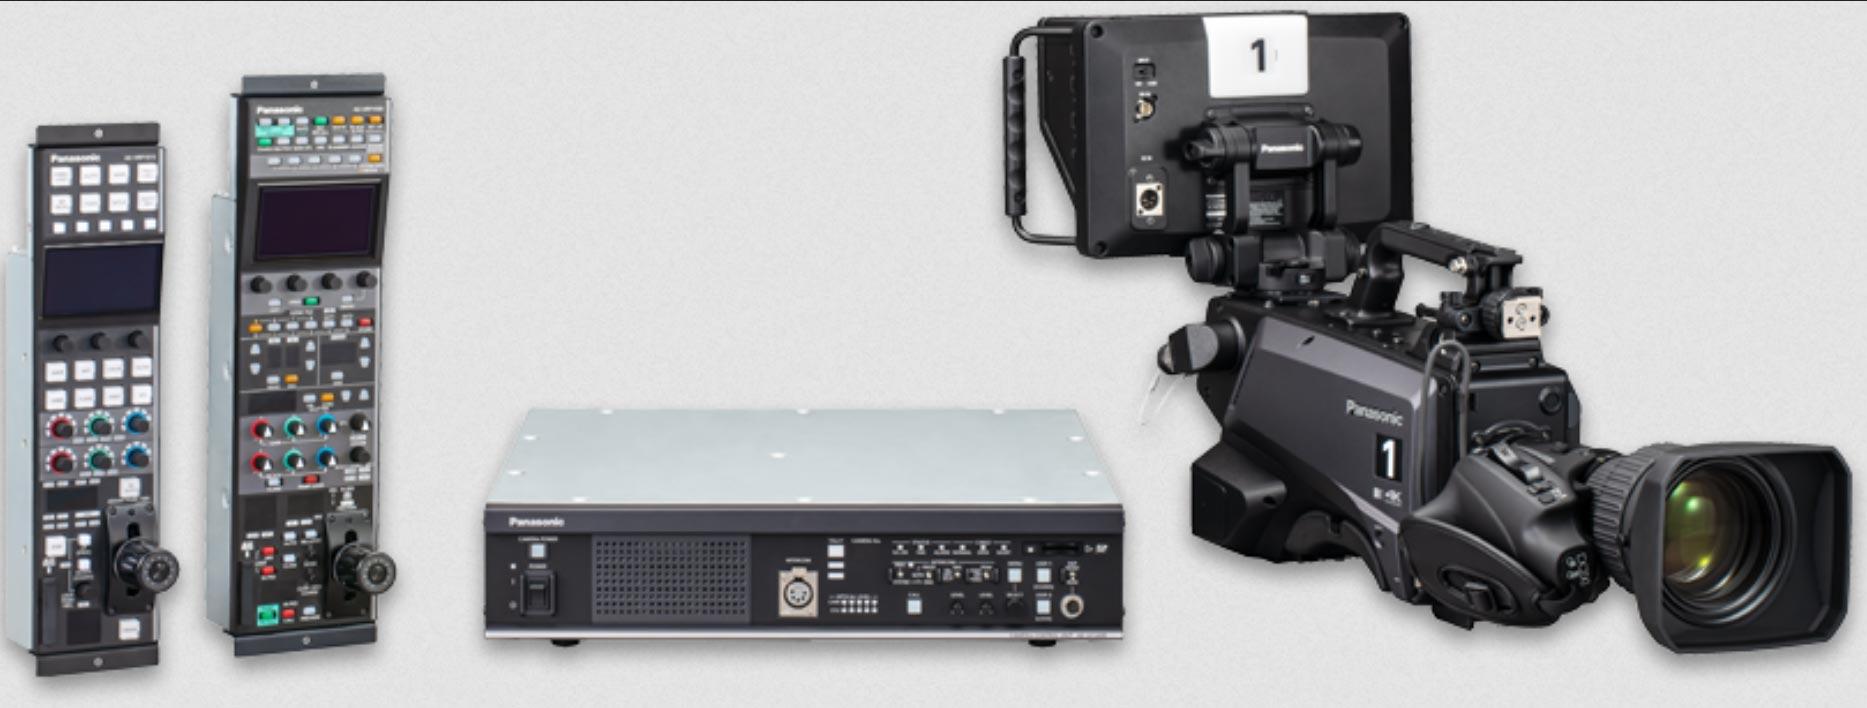 Panasonic AK-UC3300 studio camera, a future-proof solution